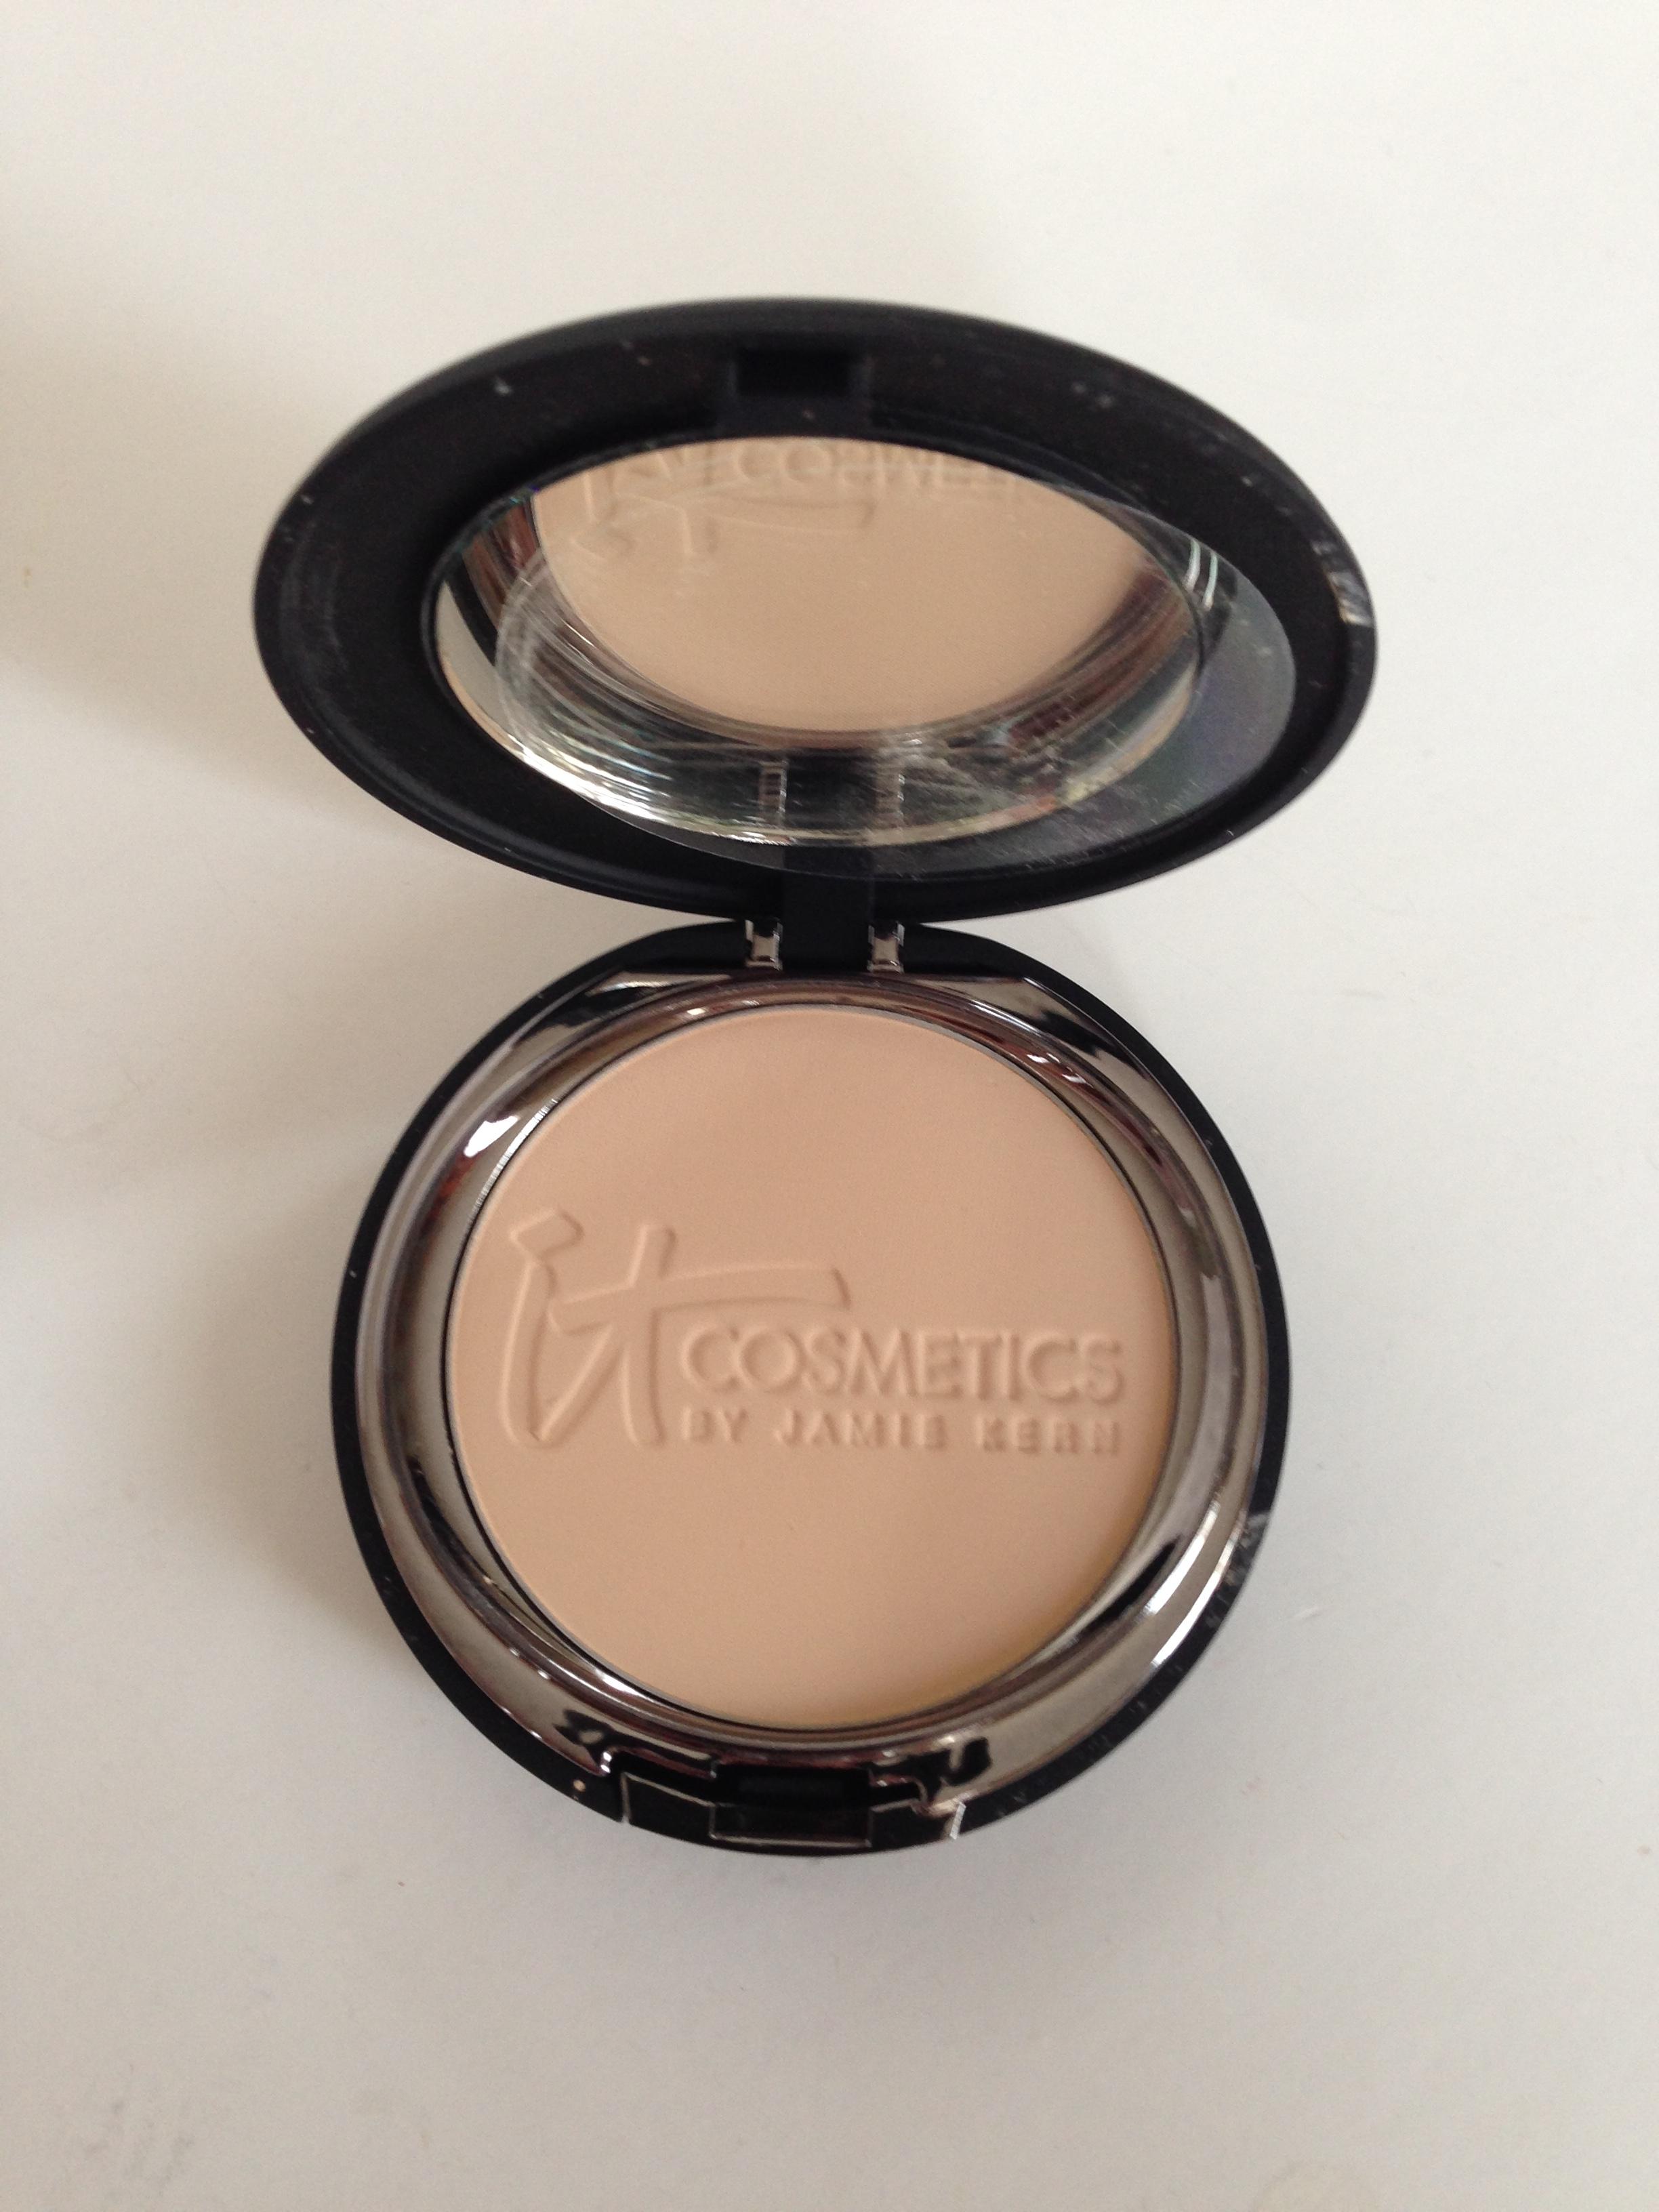 Foundation Cosmetics: Friday Find: IT Cosmetics Celebration Powder Foundation